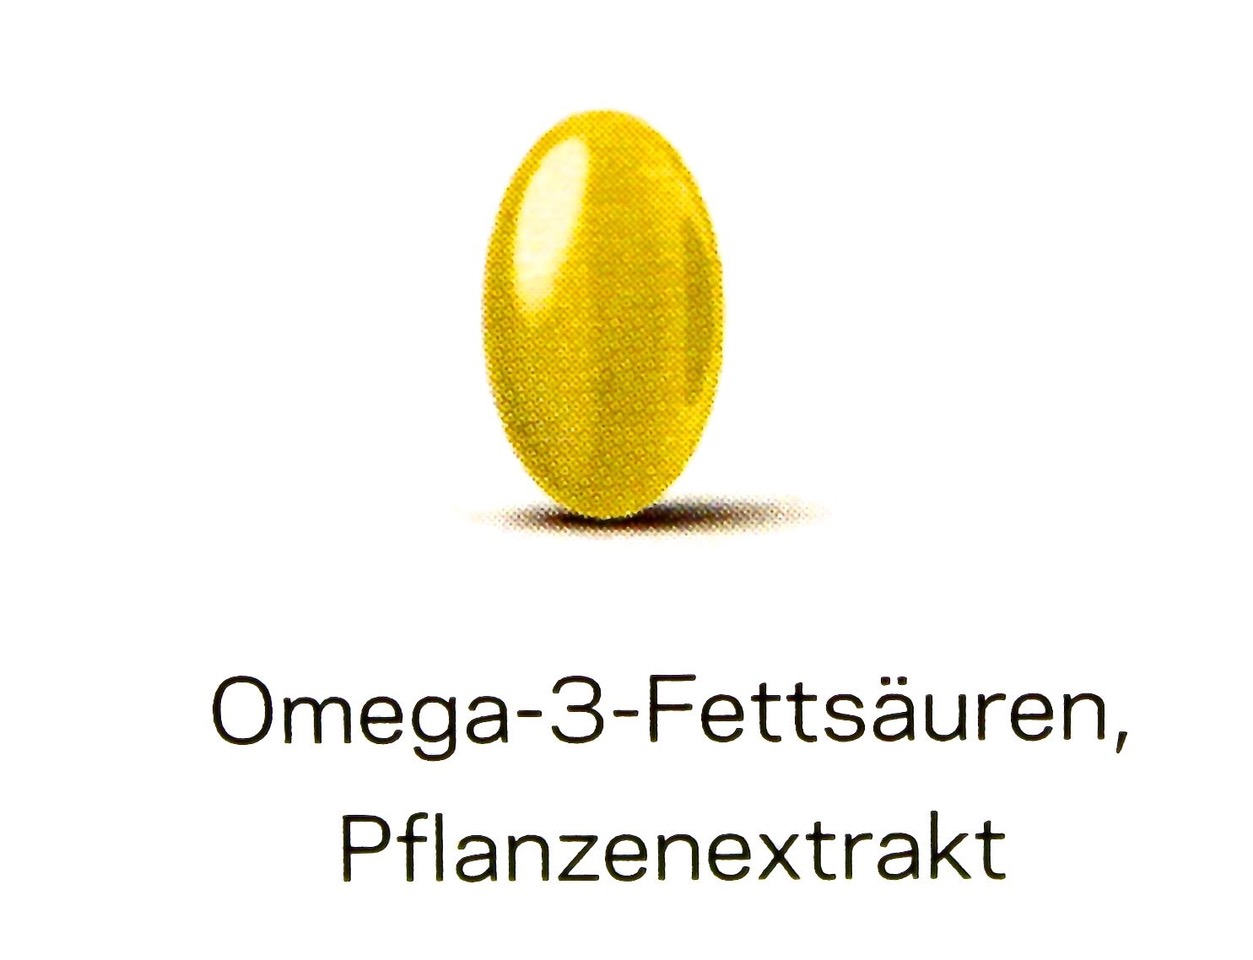 Omega-3- Fettsäure, Pflanzenextrakt